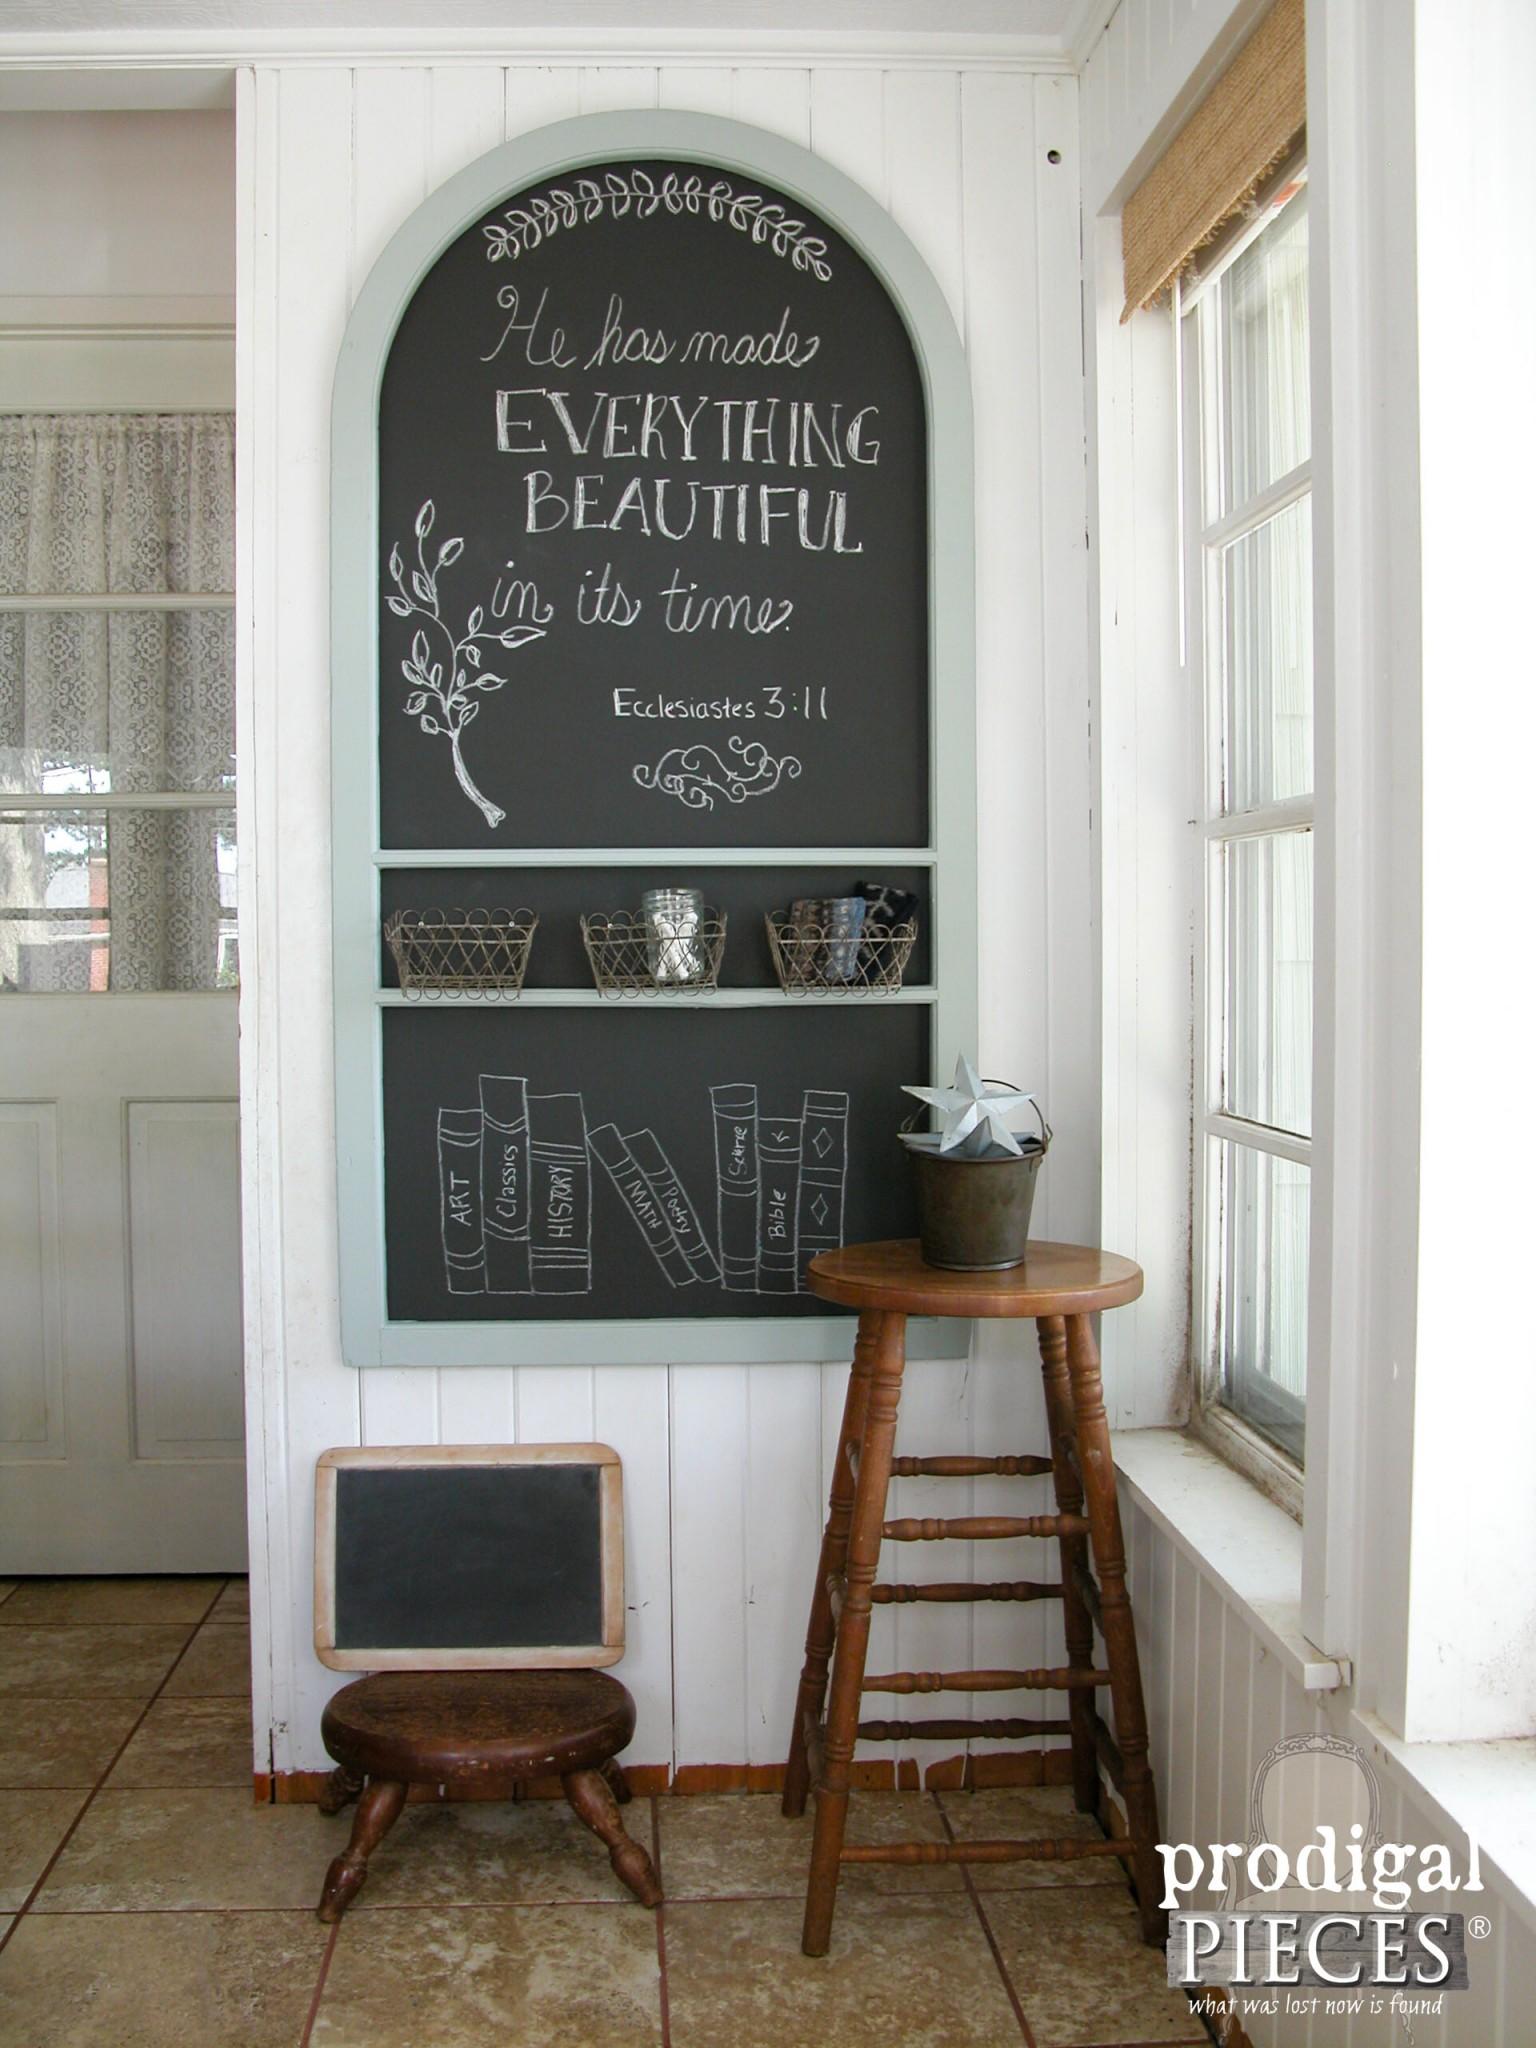 Chalkboard Made from Repurposed Screen Door by Prodigal Pieces | .prodigalpieces.com & Repurposed Screen Door Chalkboard - Prodigal Pieces Pezcame.Com